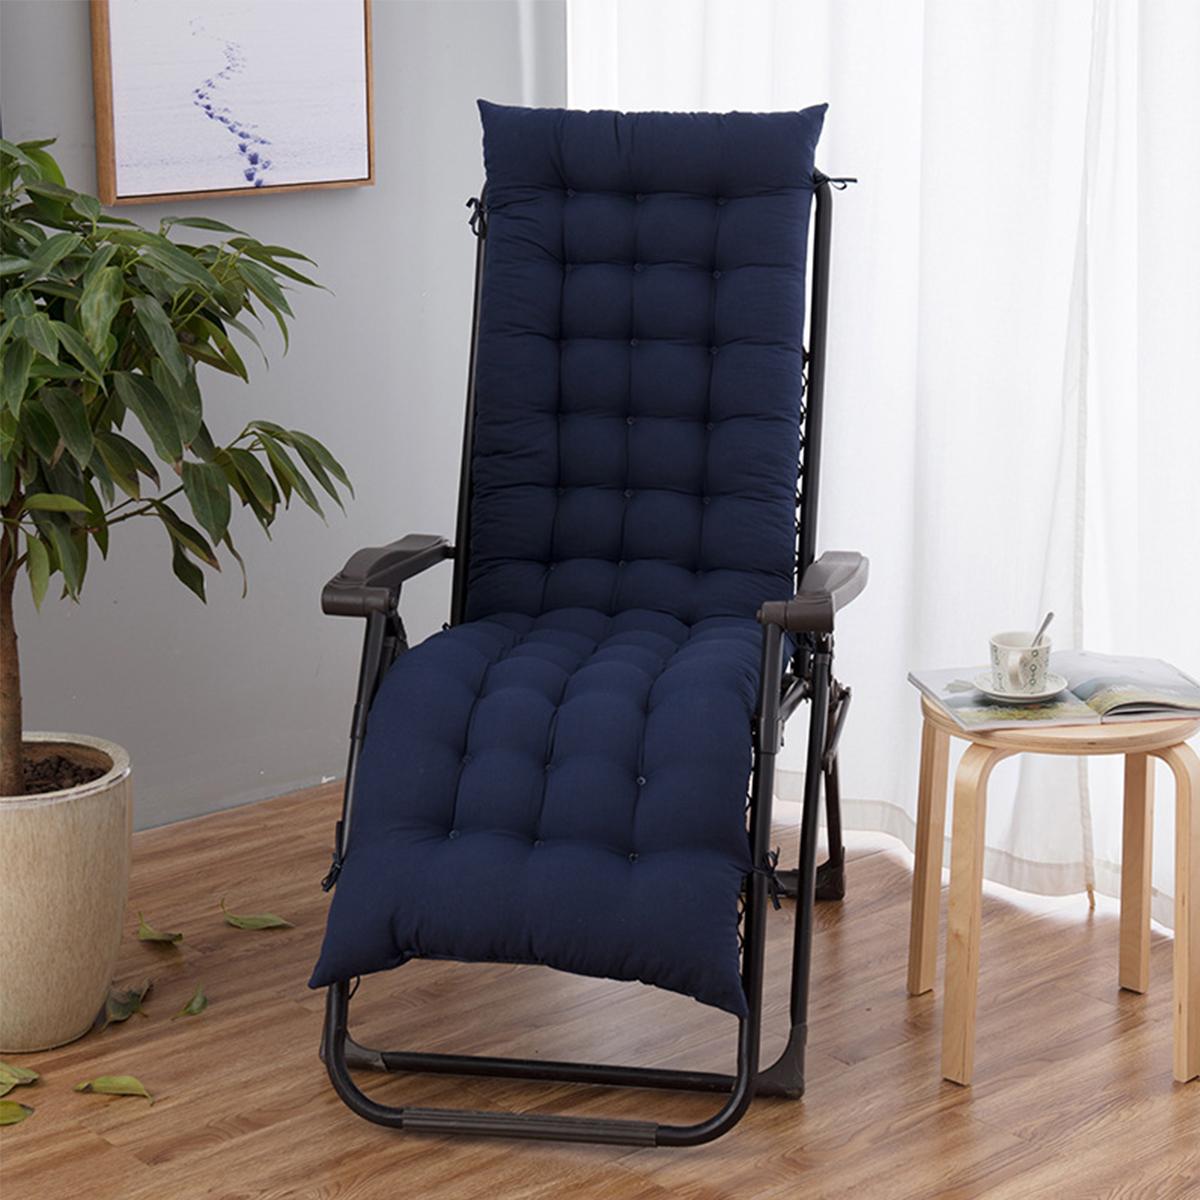 170CM Long Replacement Cushion Pads For Garden Sun Lounger Recliner Chair